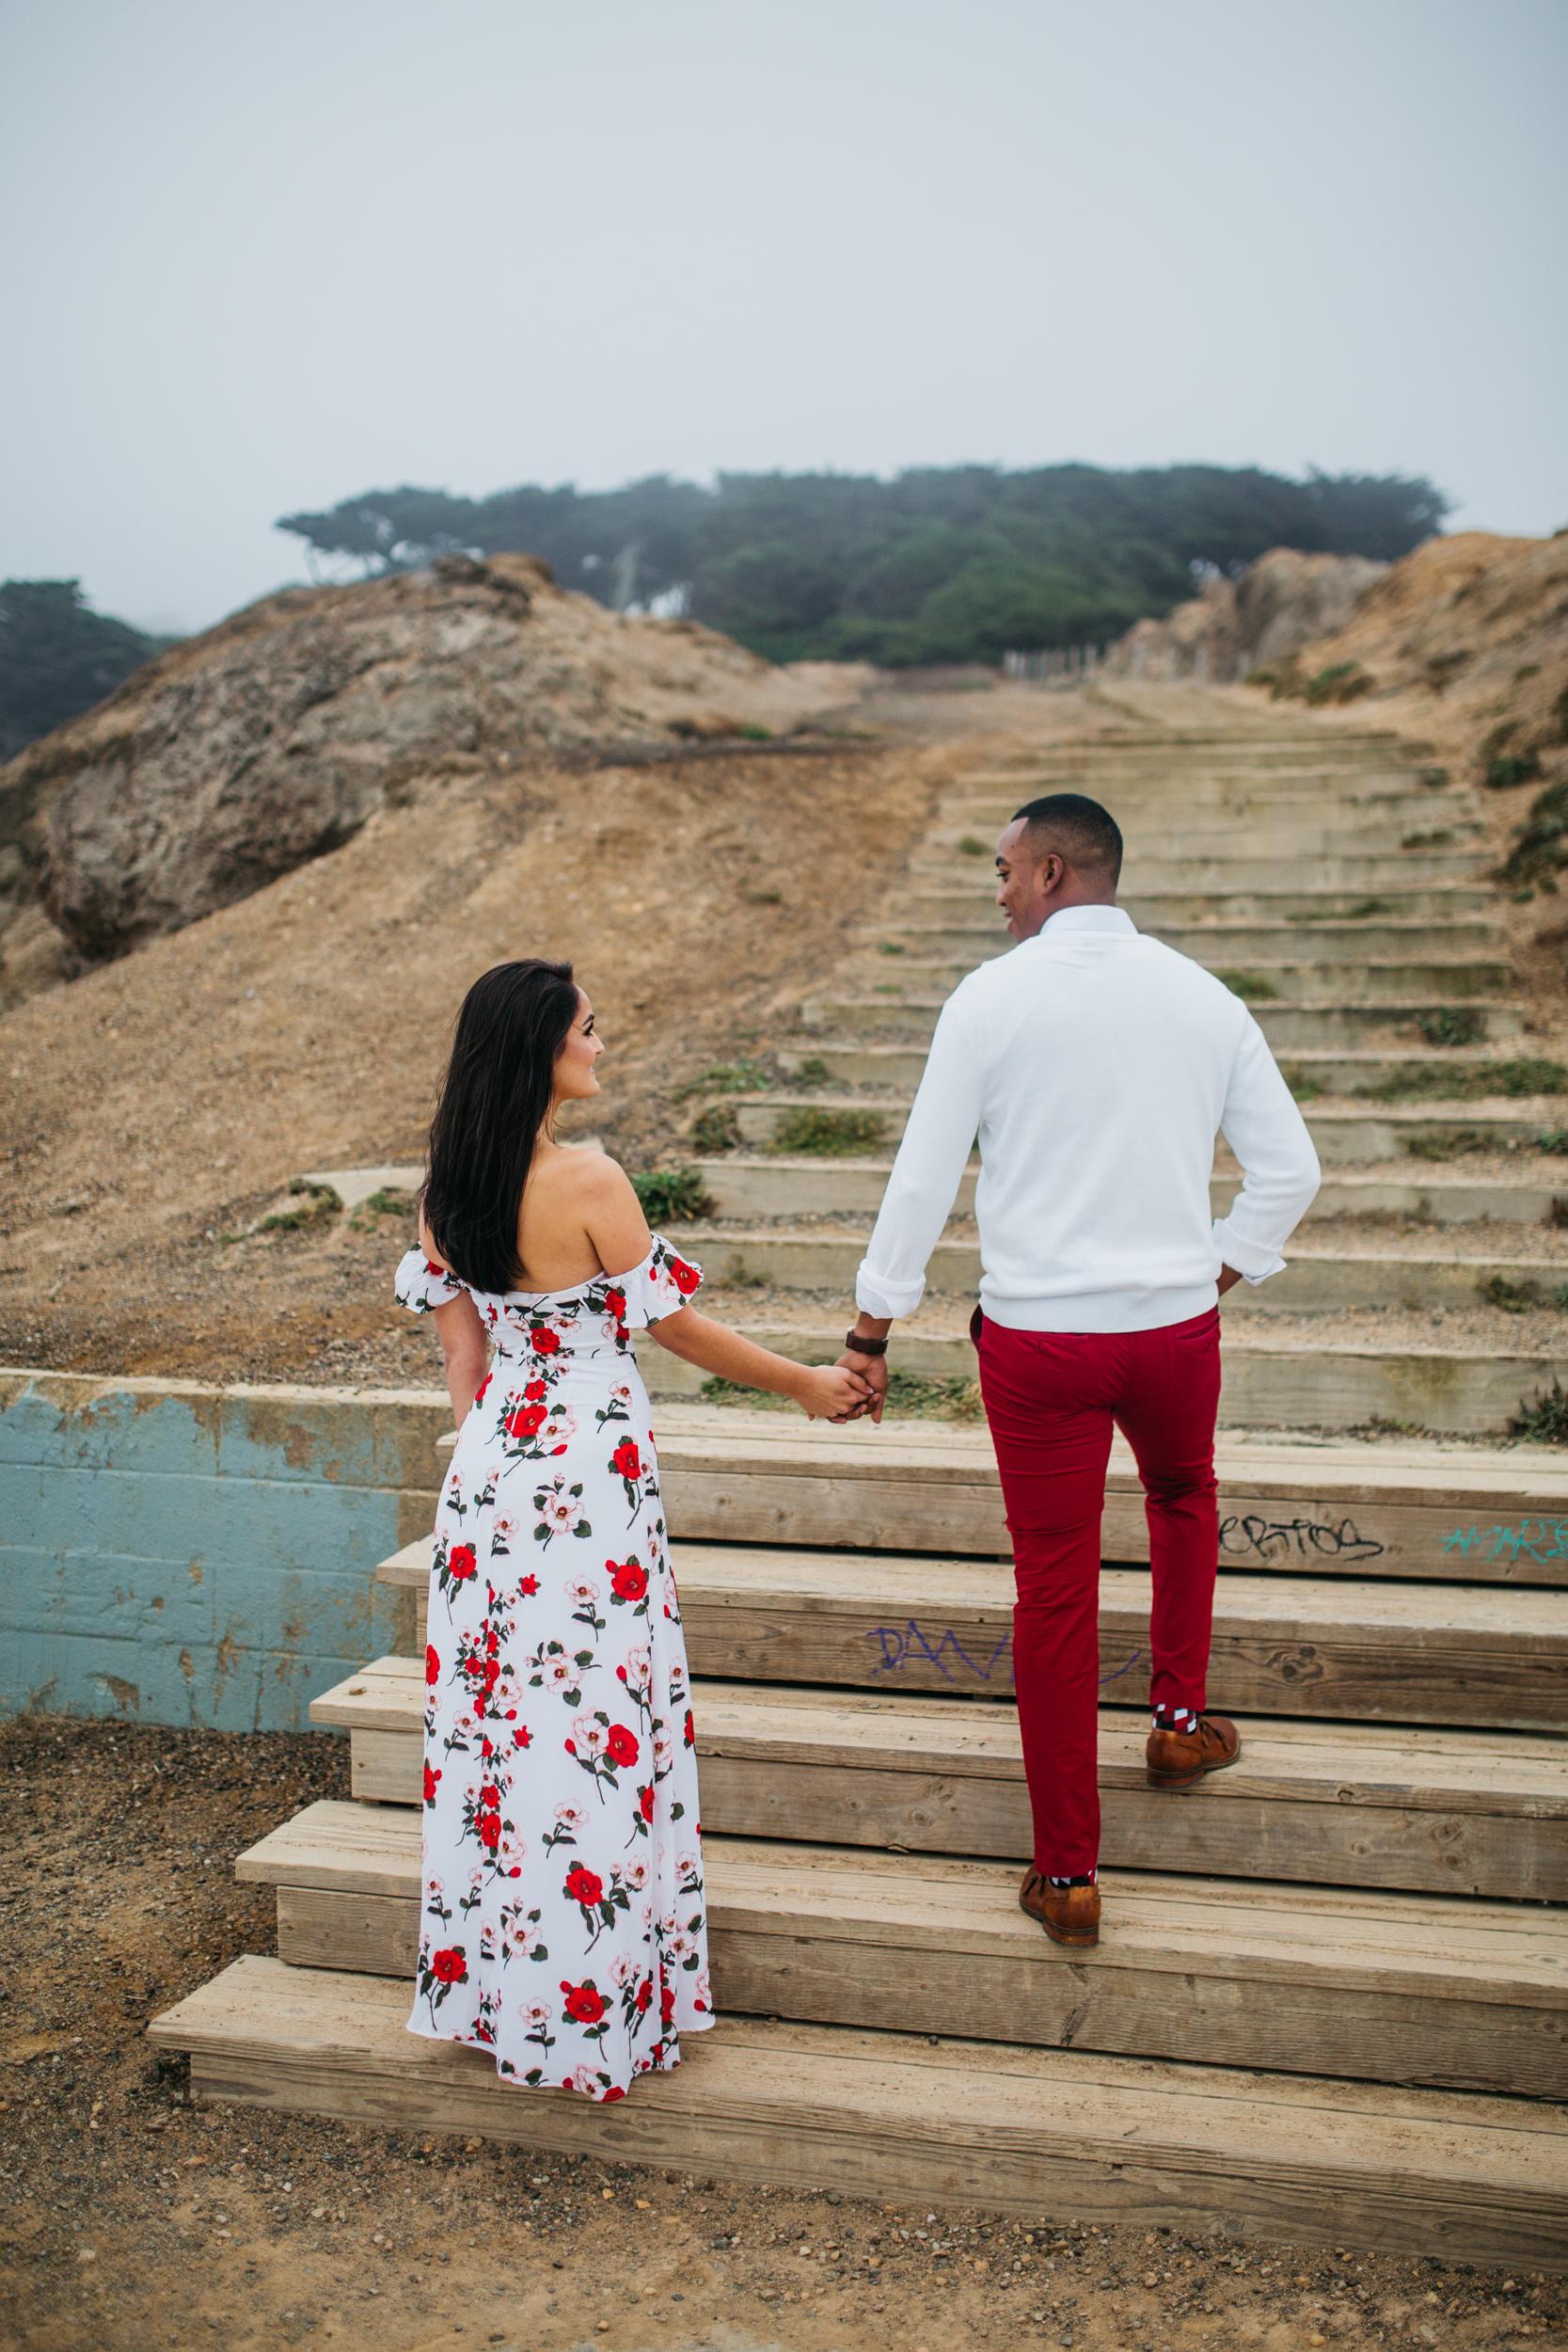 Engagement Photos-Ranalla Photo and Films-14.jpg